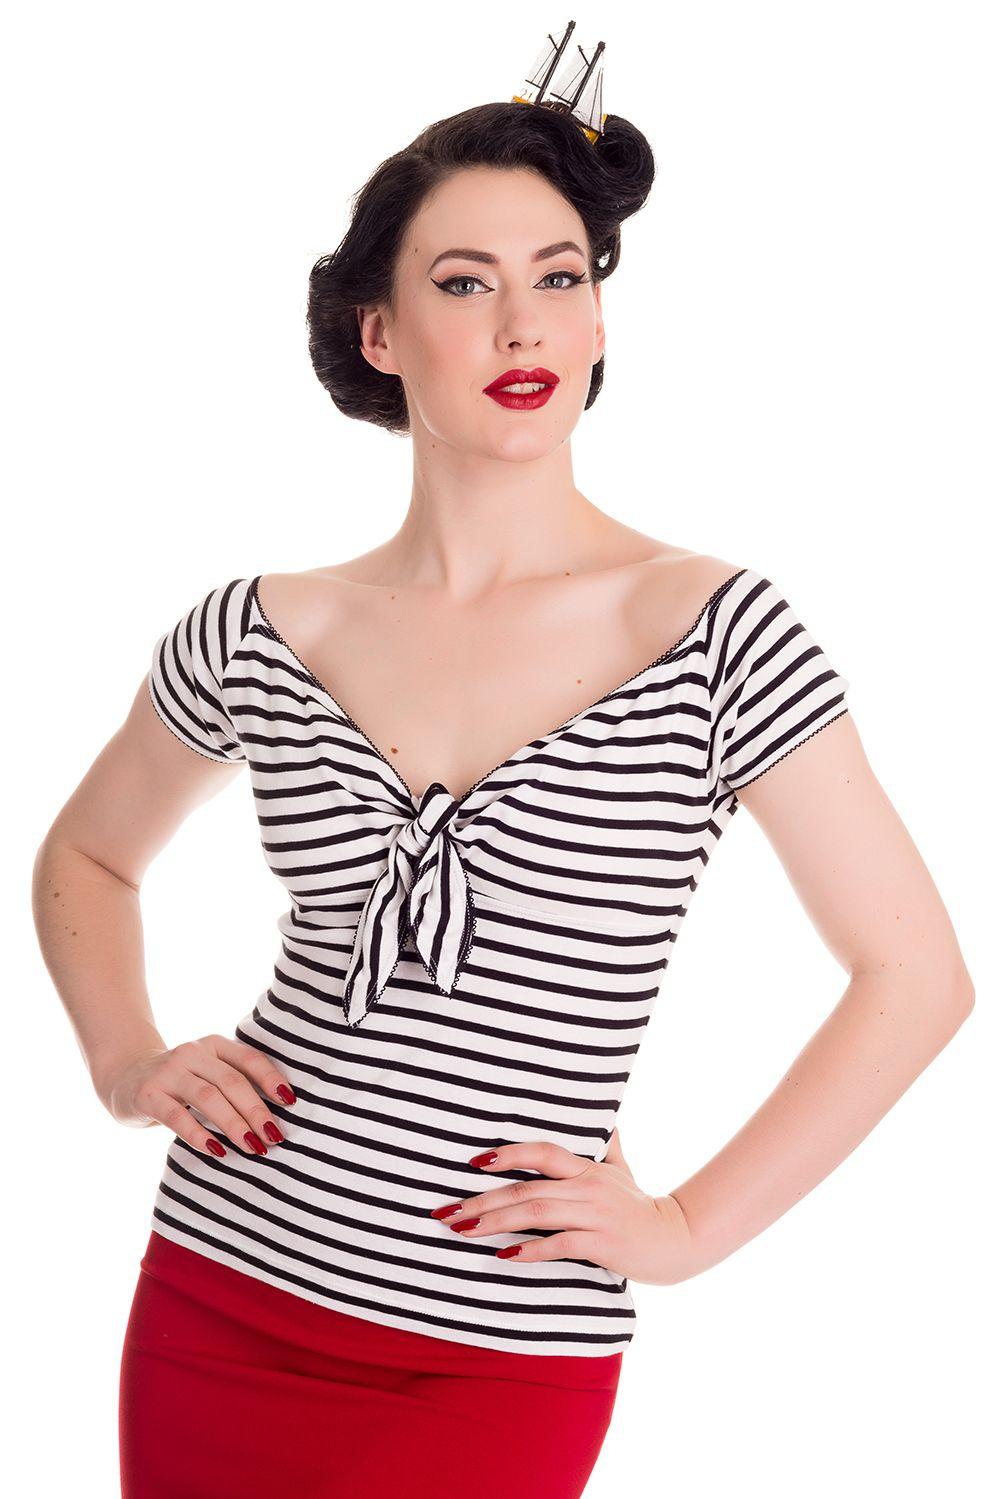 ps6453b_top_tee_shirt_rockabilly_pin-up_r_tro_50_s_sailor_dolly